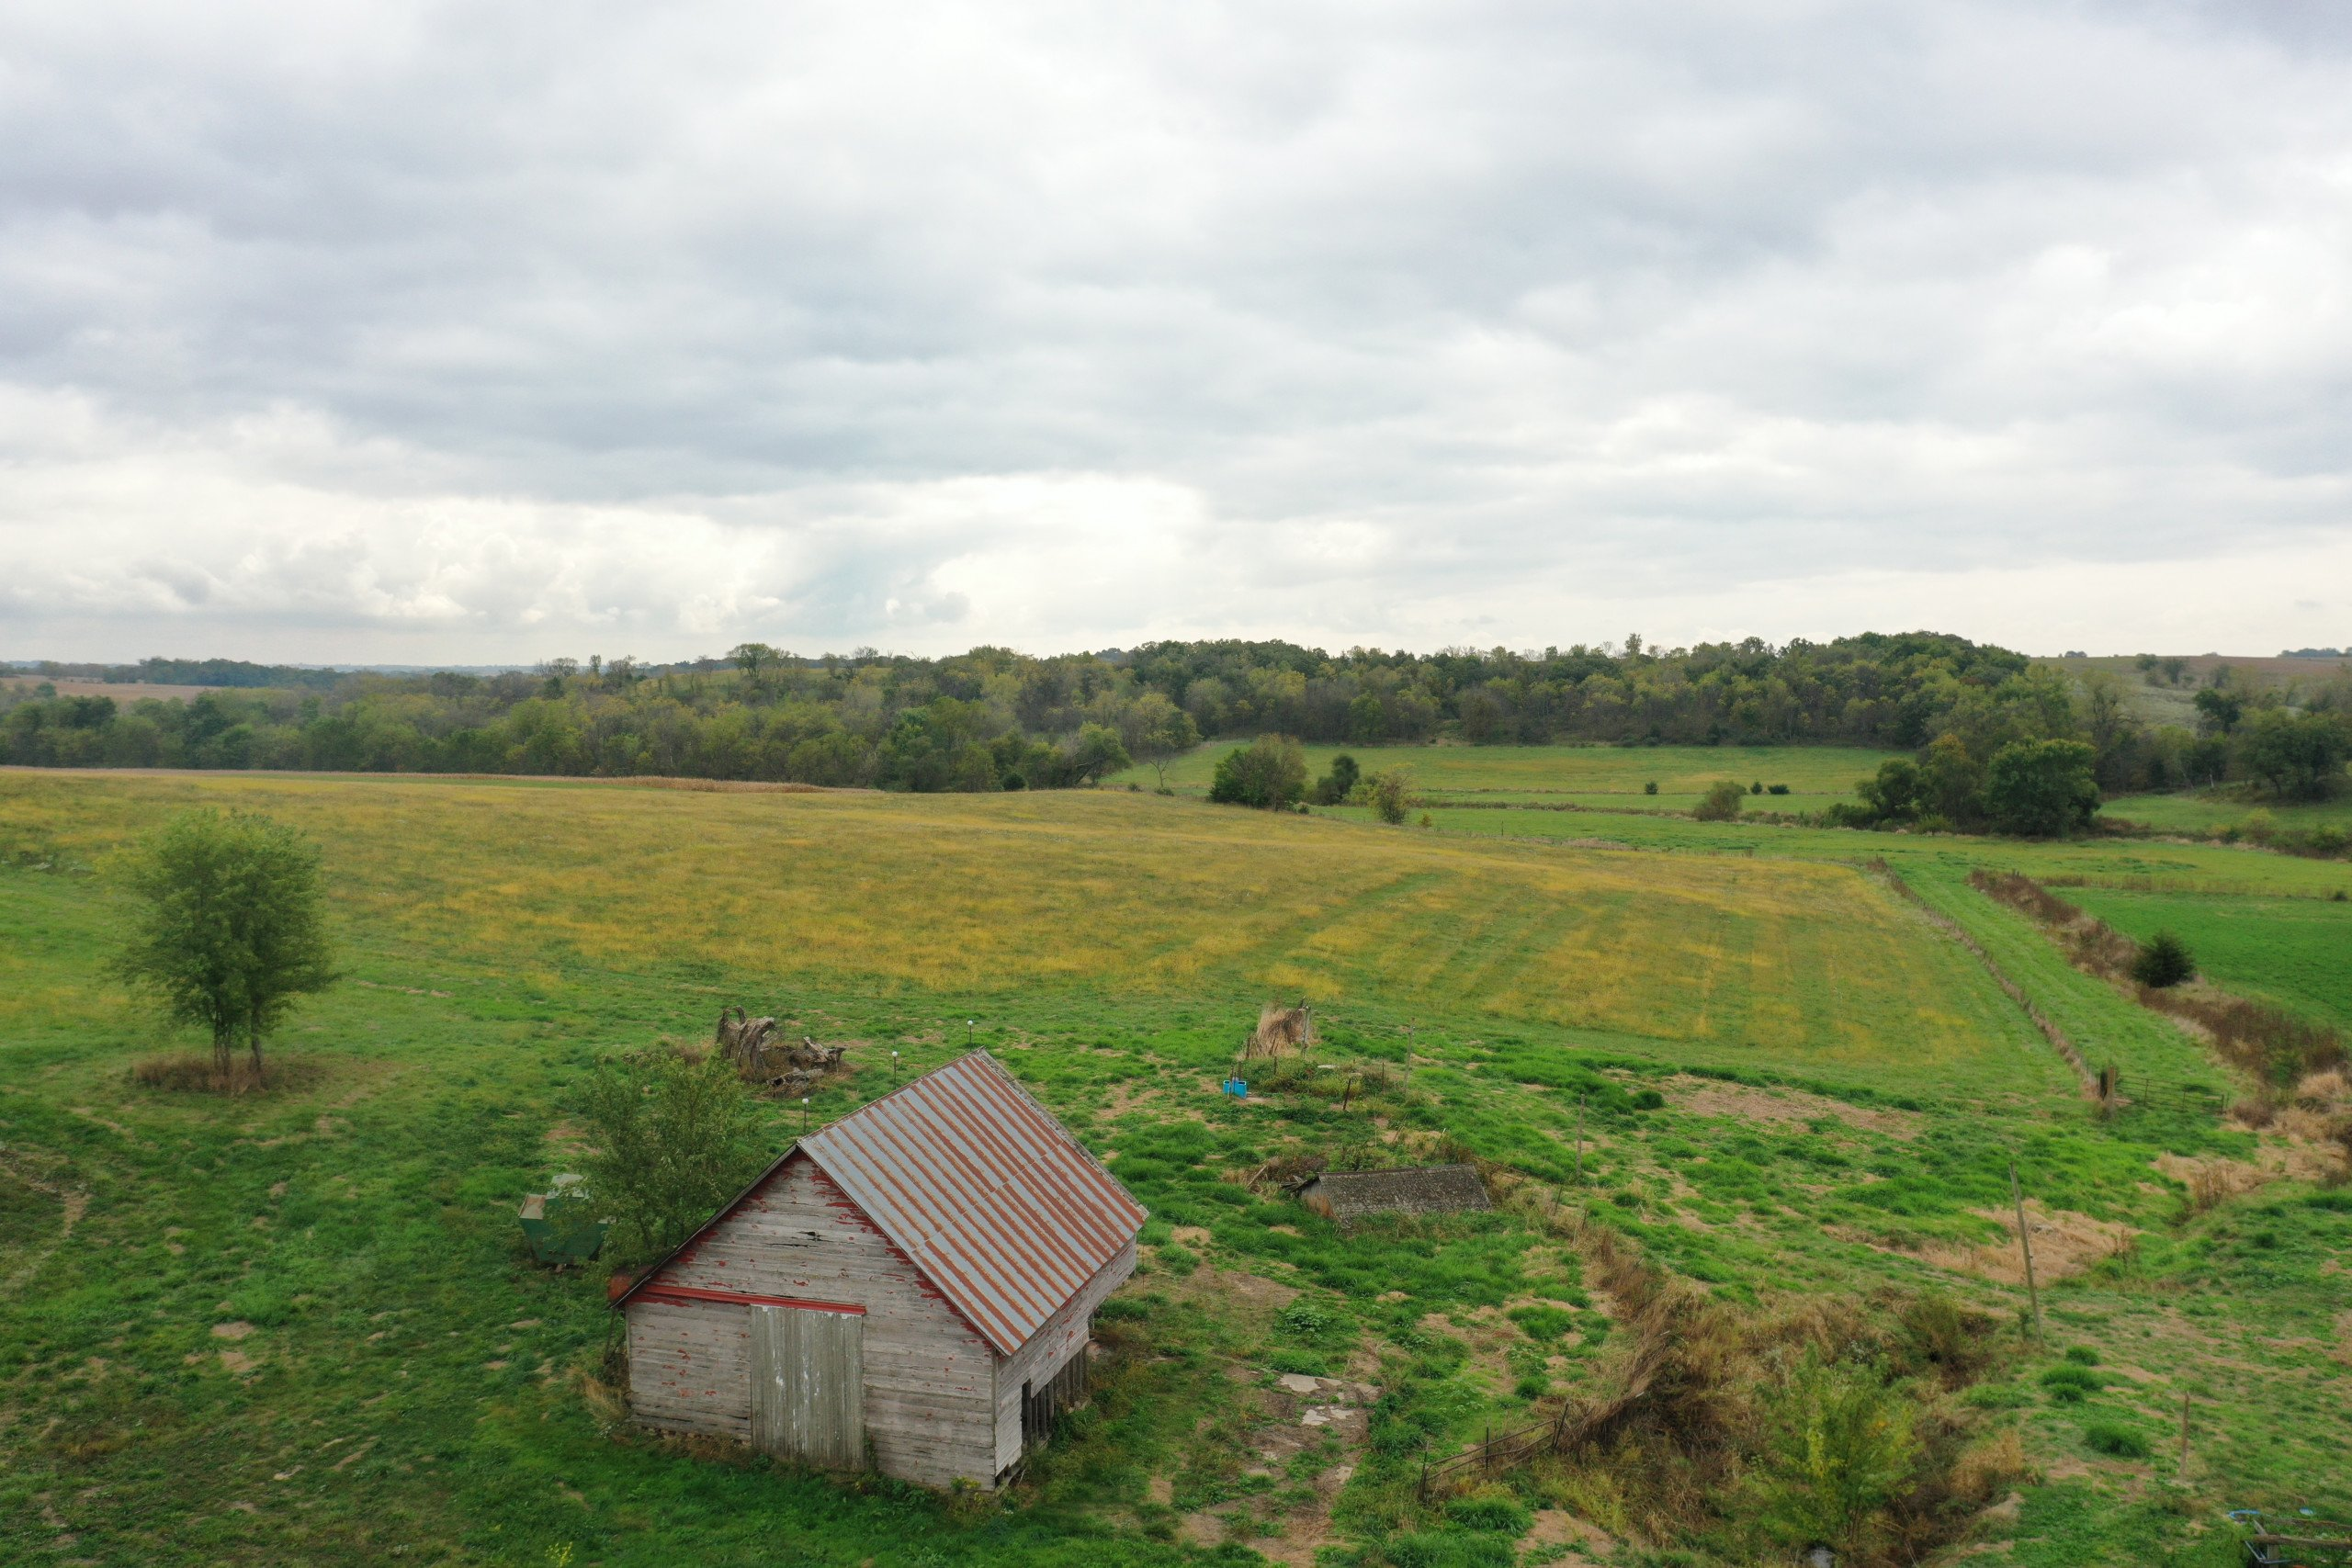 land-warren-county-iowa-200-acres-listing-number-15810-DJI_0566-3.jpg